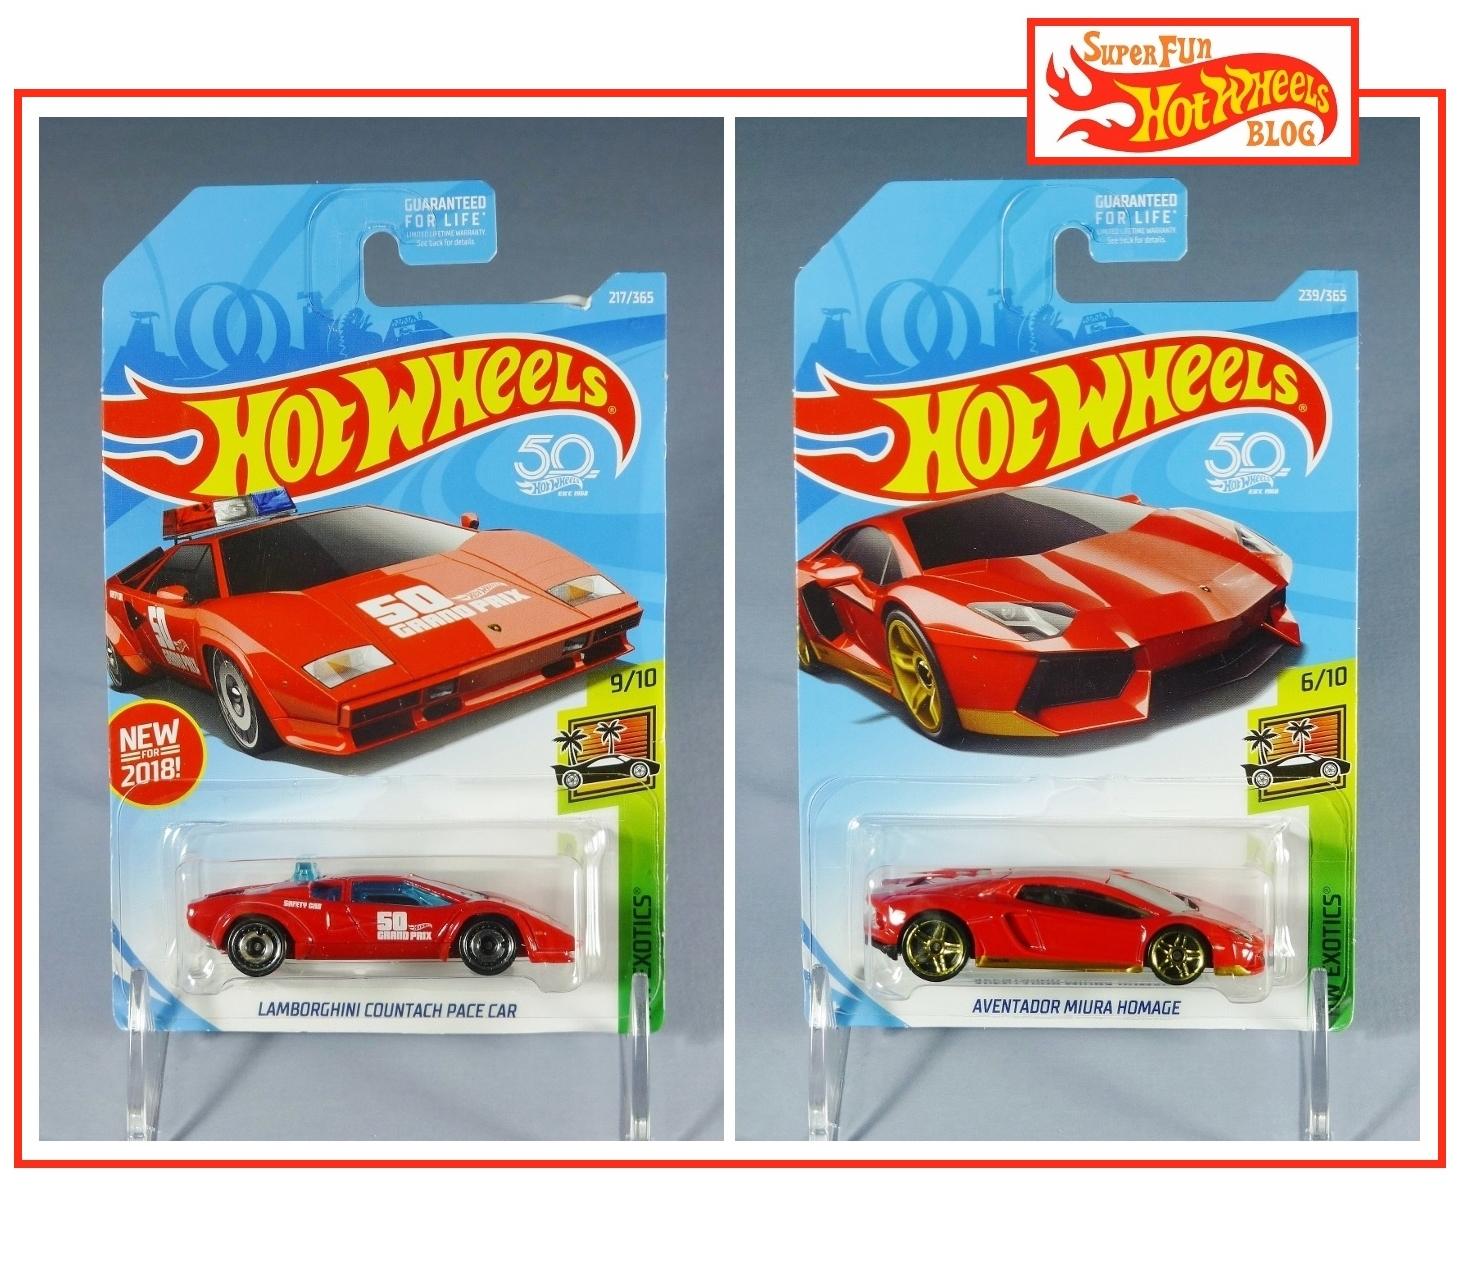 Super Fun Hot Wheels Blog Hw Lamborghini Countach Pace Car